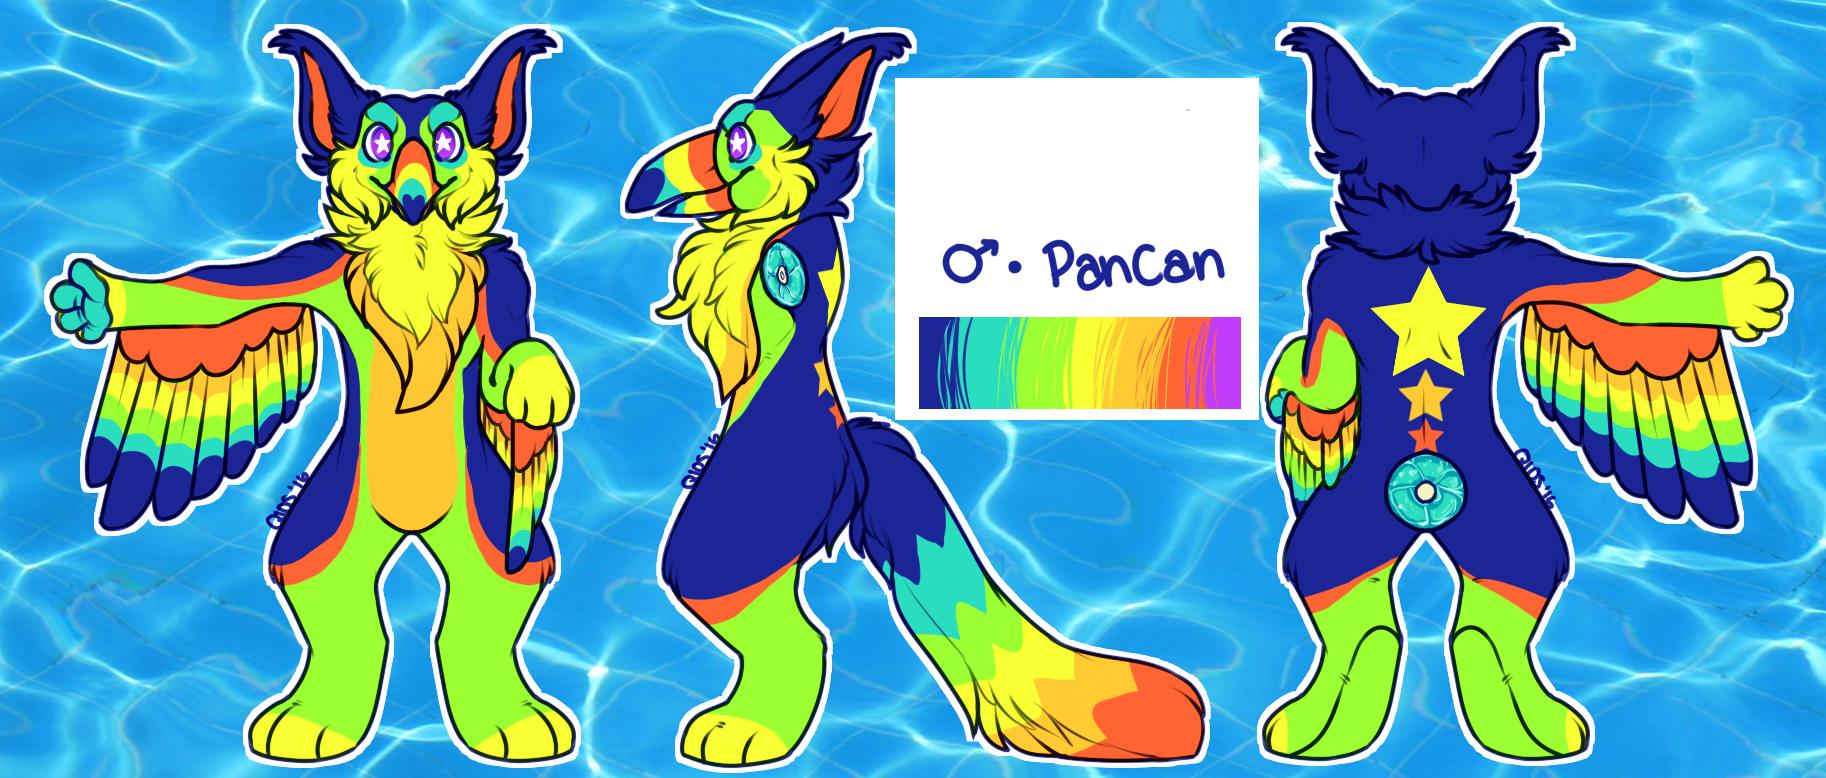 pancan! by irlnya